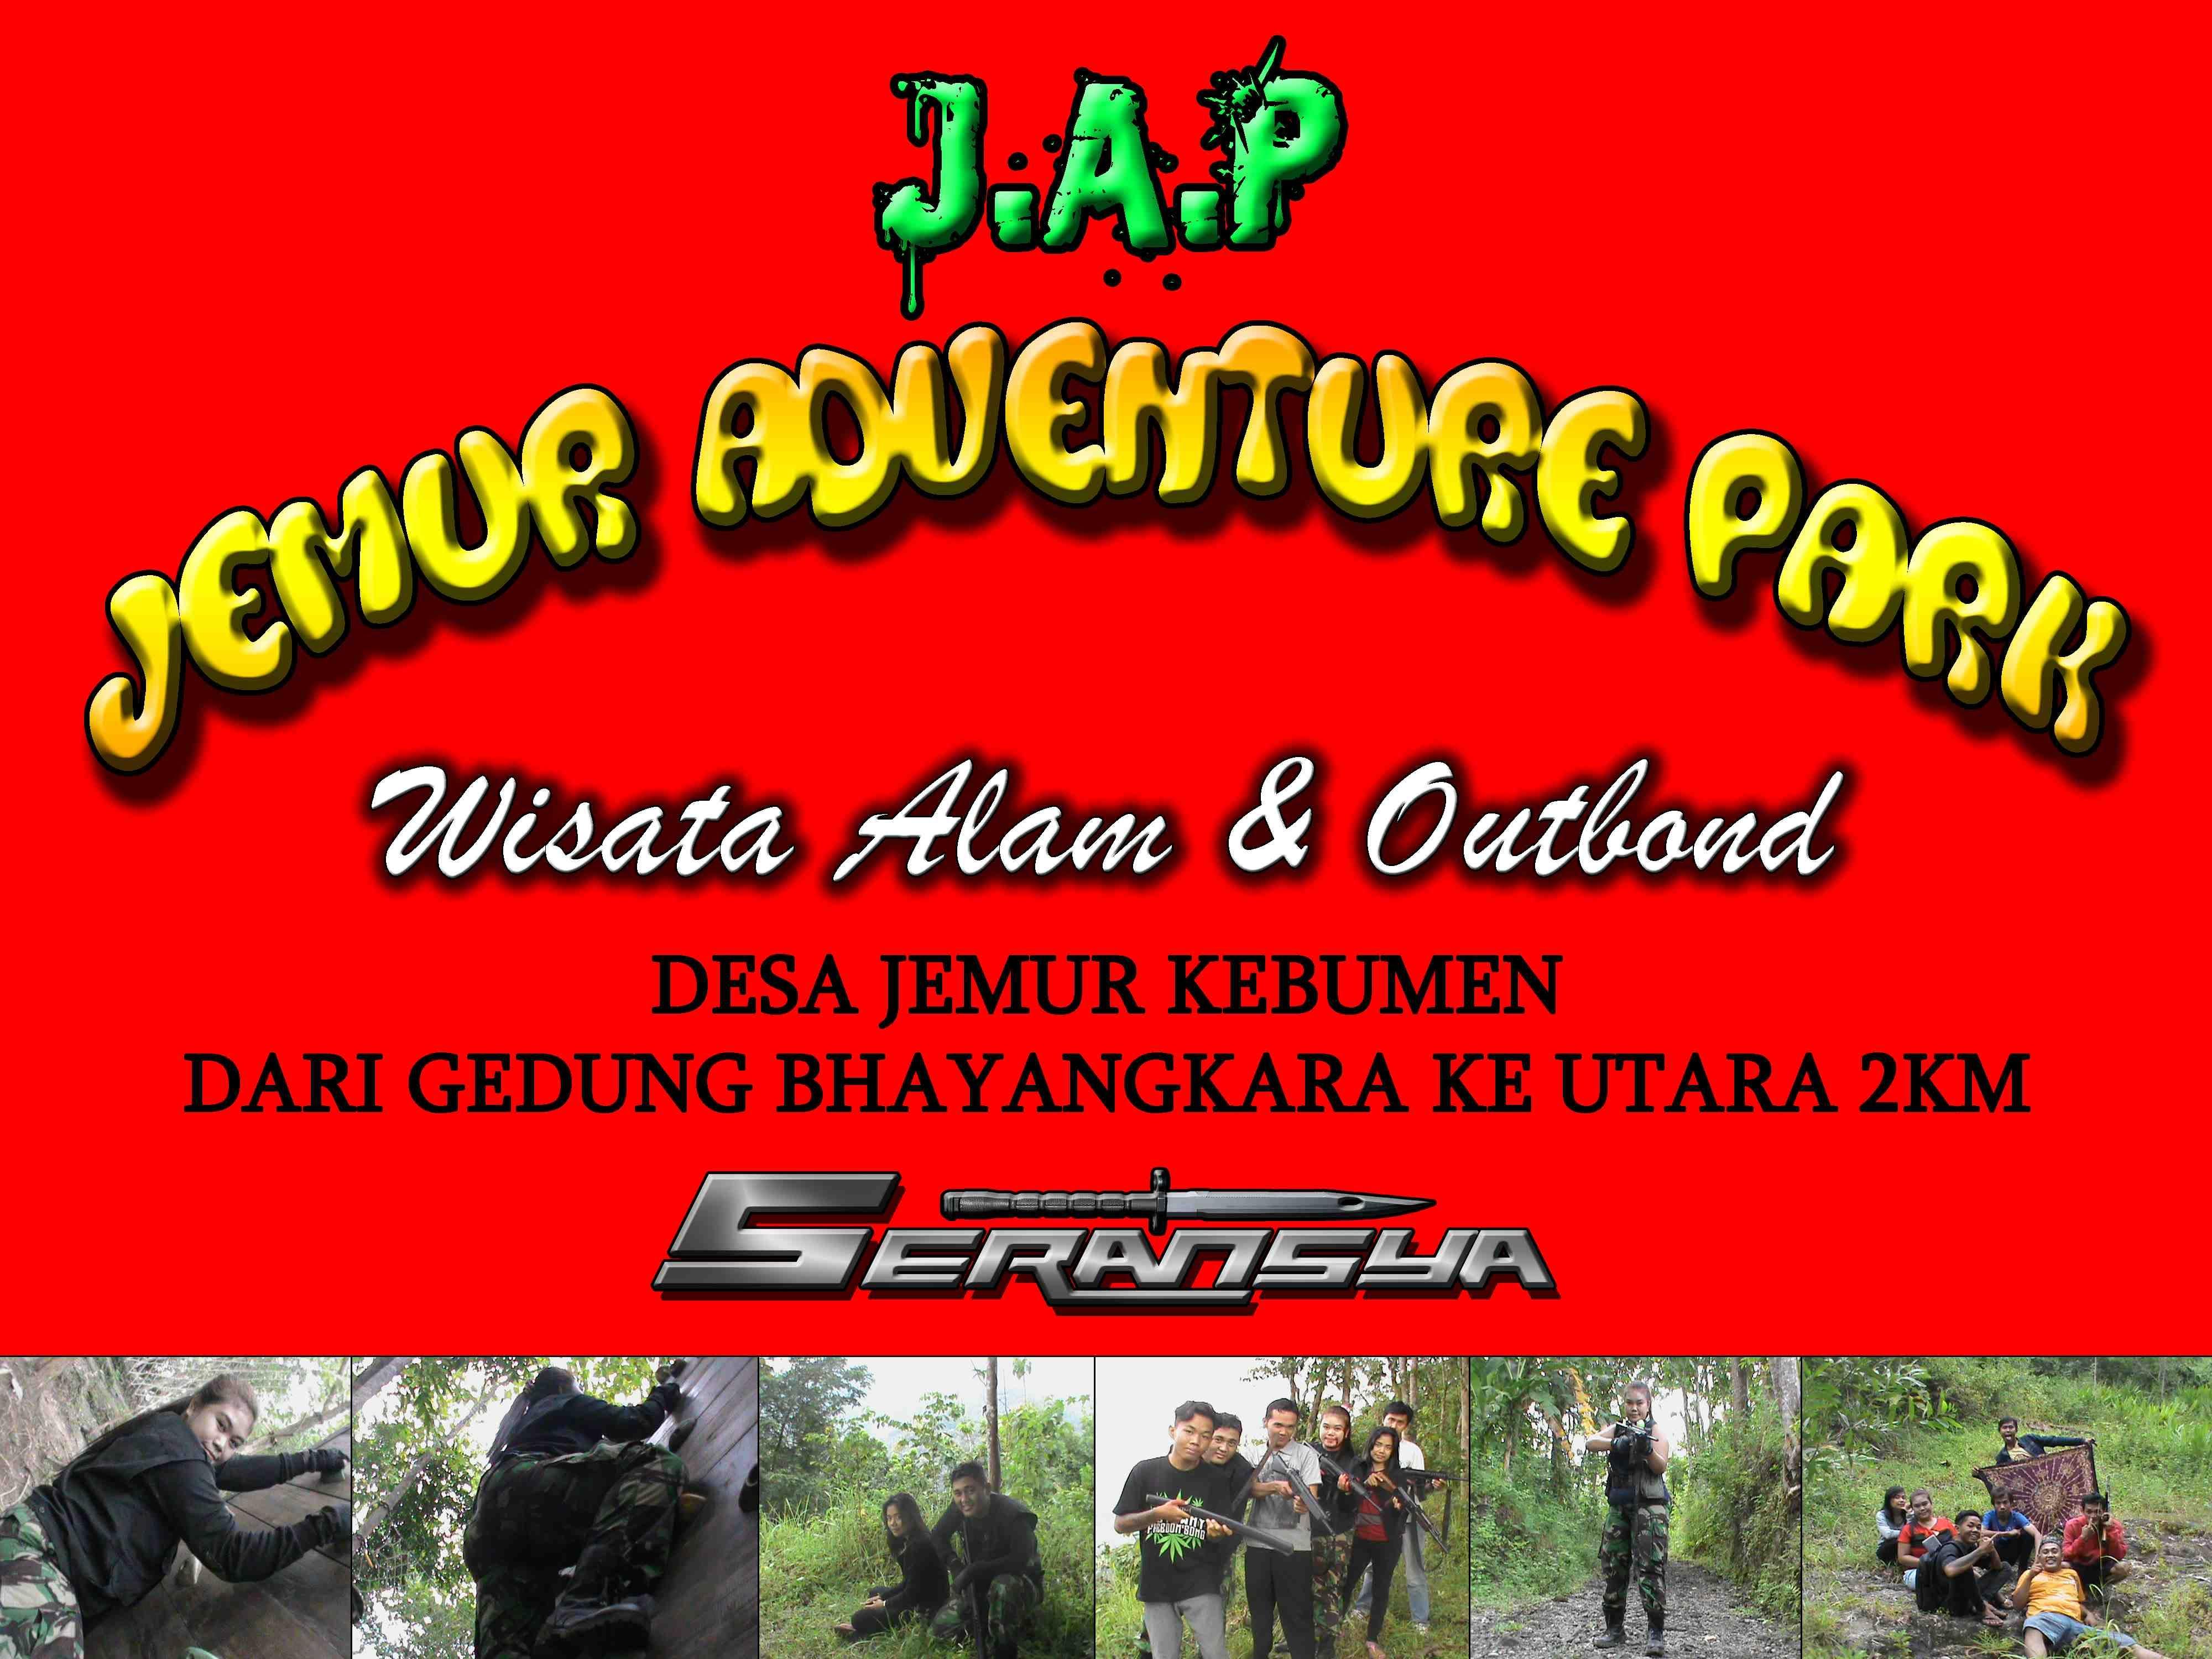 Jemur Adventure Park Wisata Alam Outbond Kebumen Youtube Kab